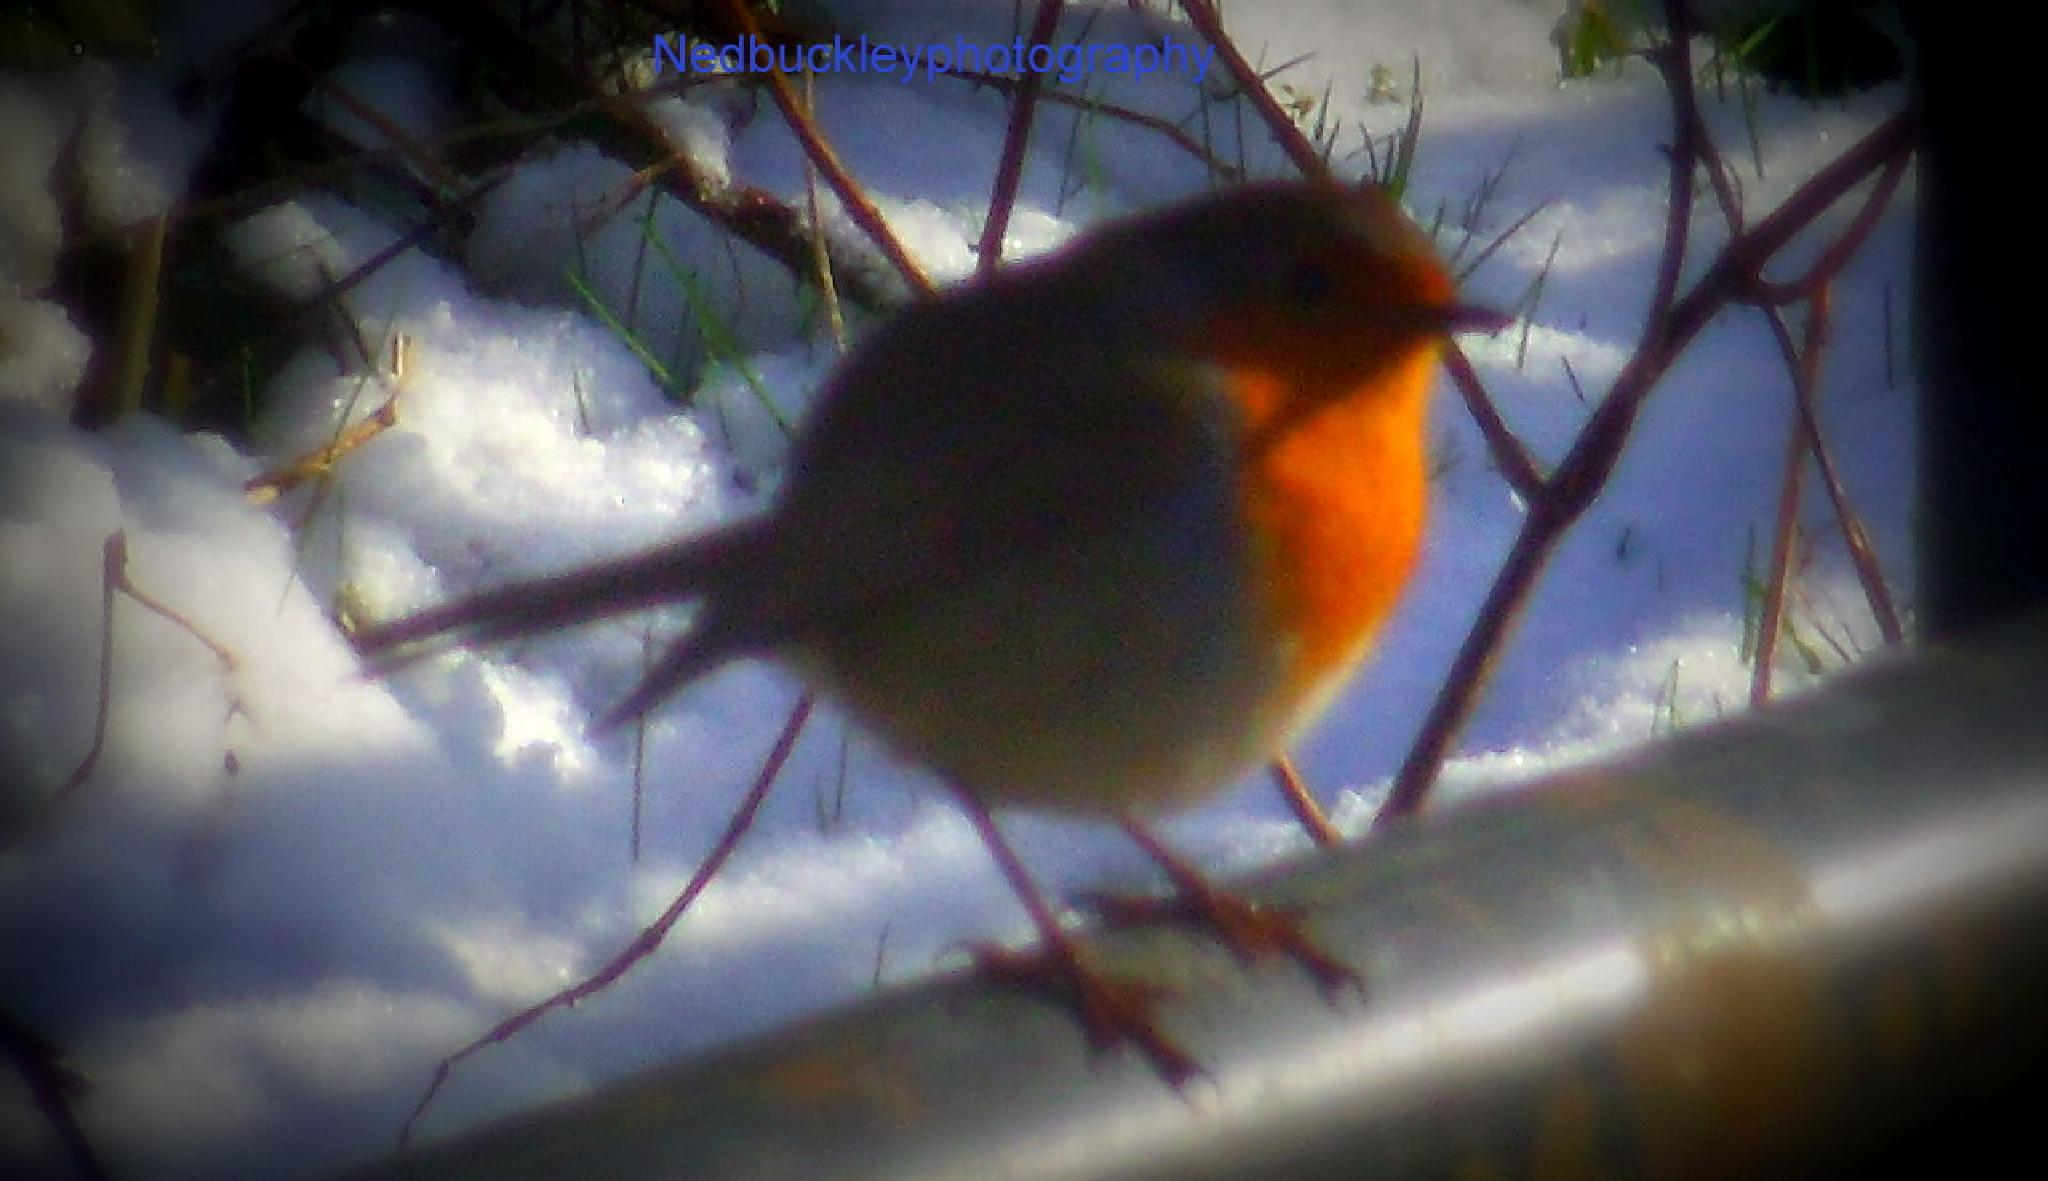 Irish Robin  by Nedbuckleyphotography